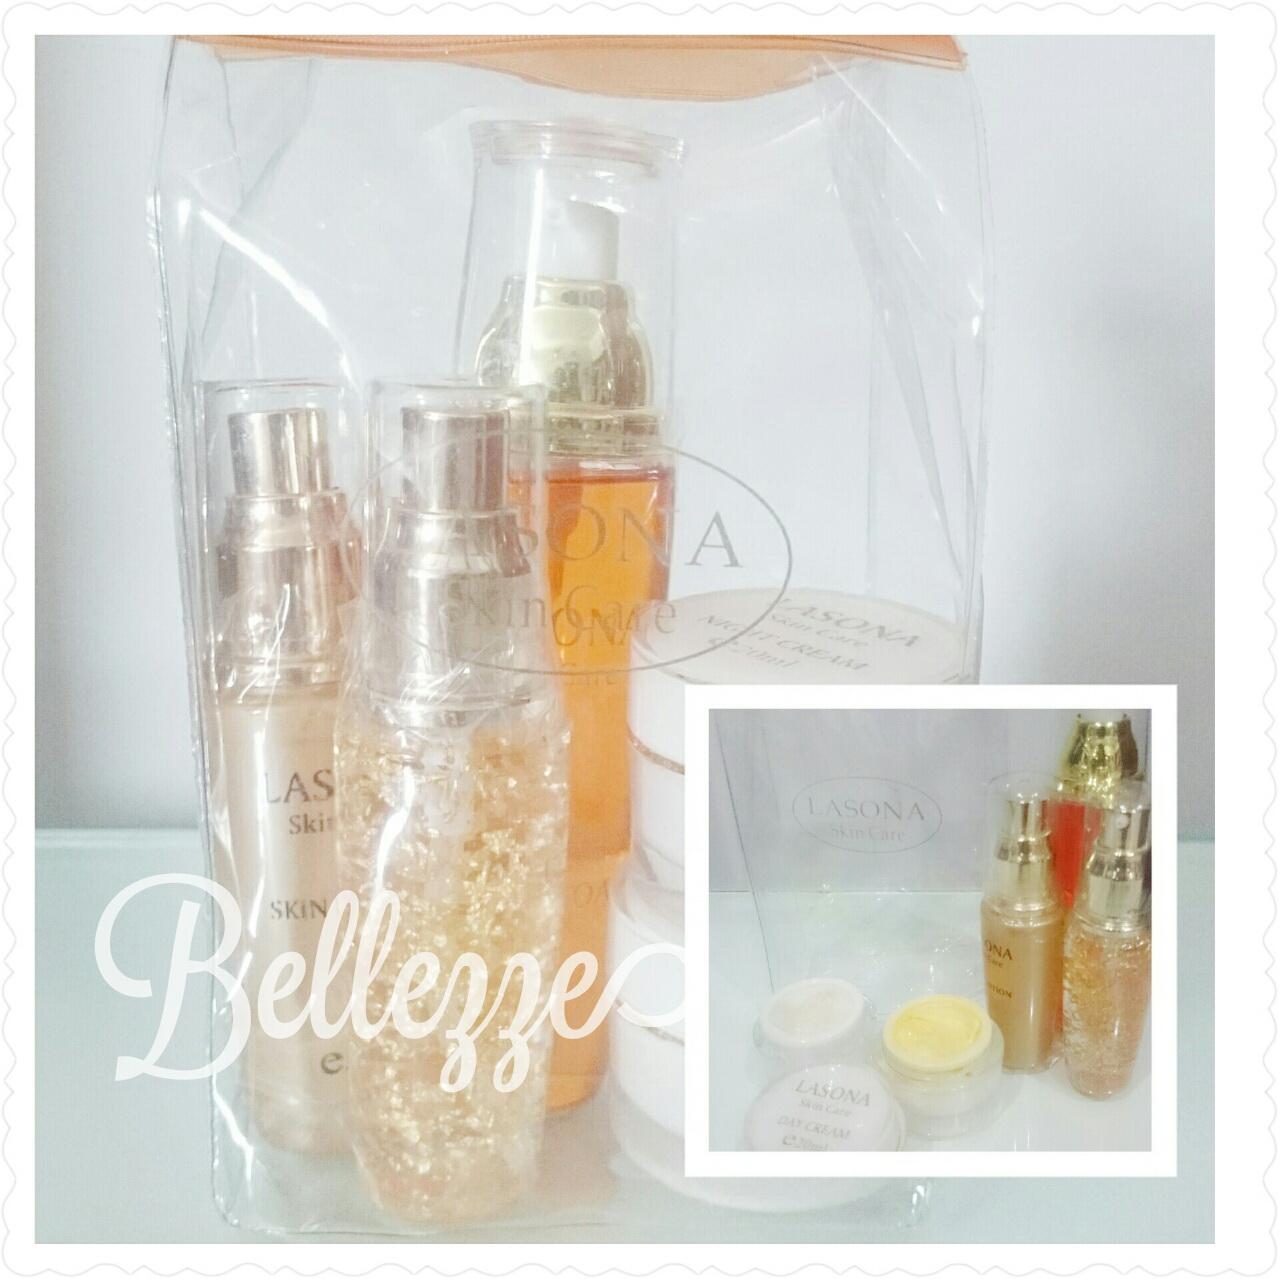 Jual Lasona Skin Care Original Bellezzeshop Tokopedia Paket